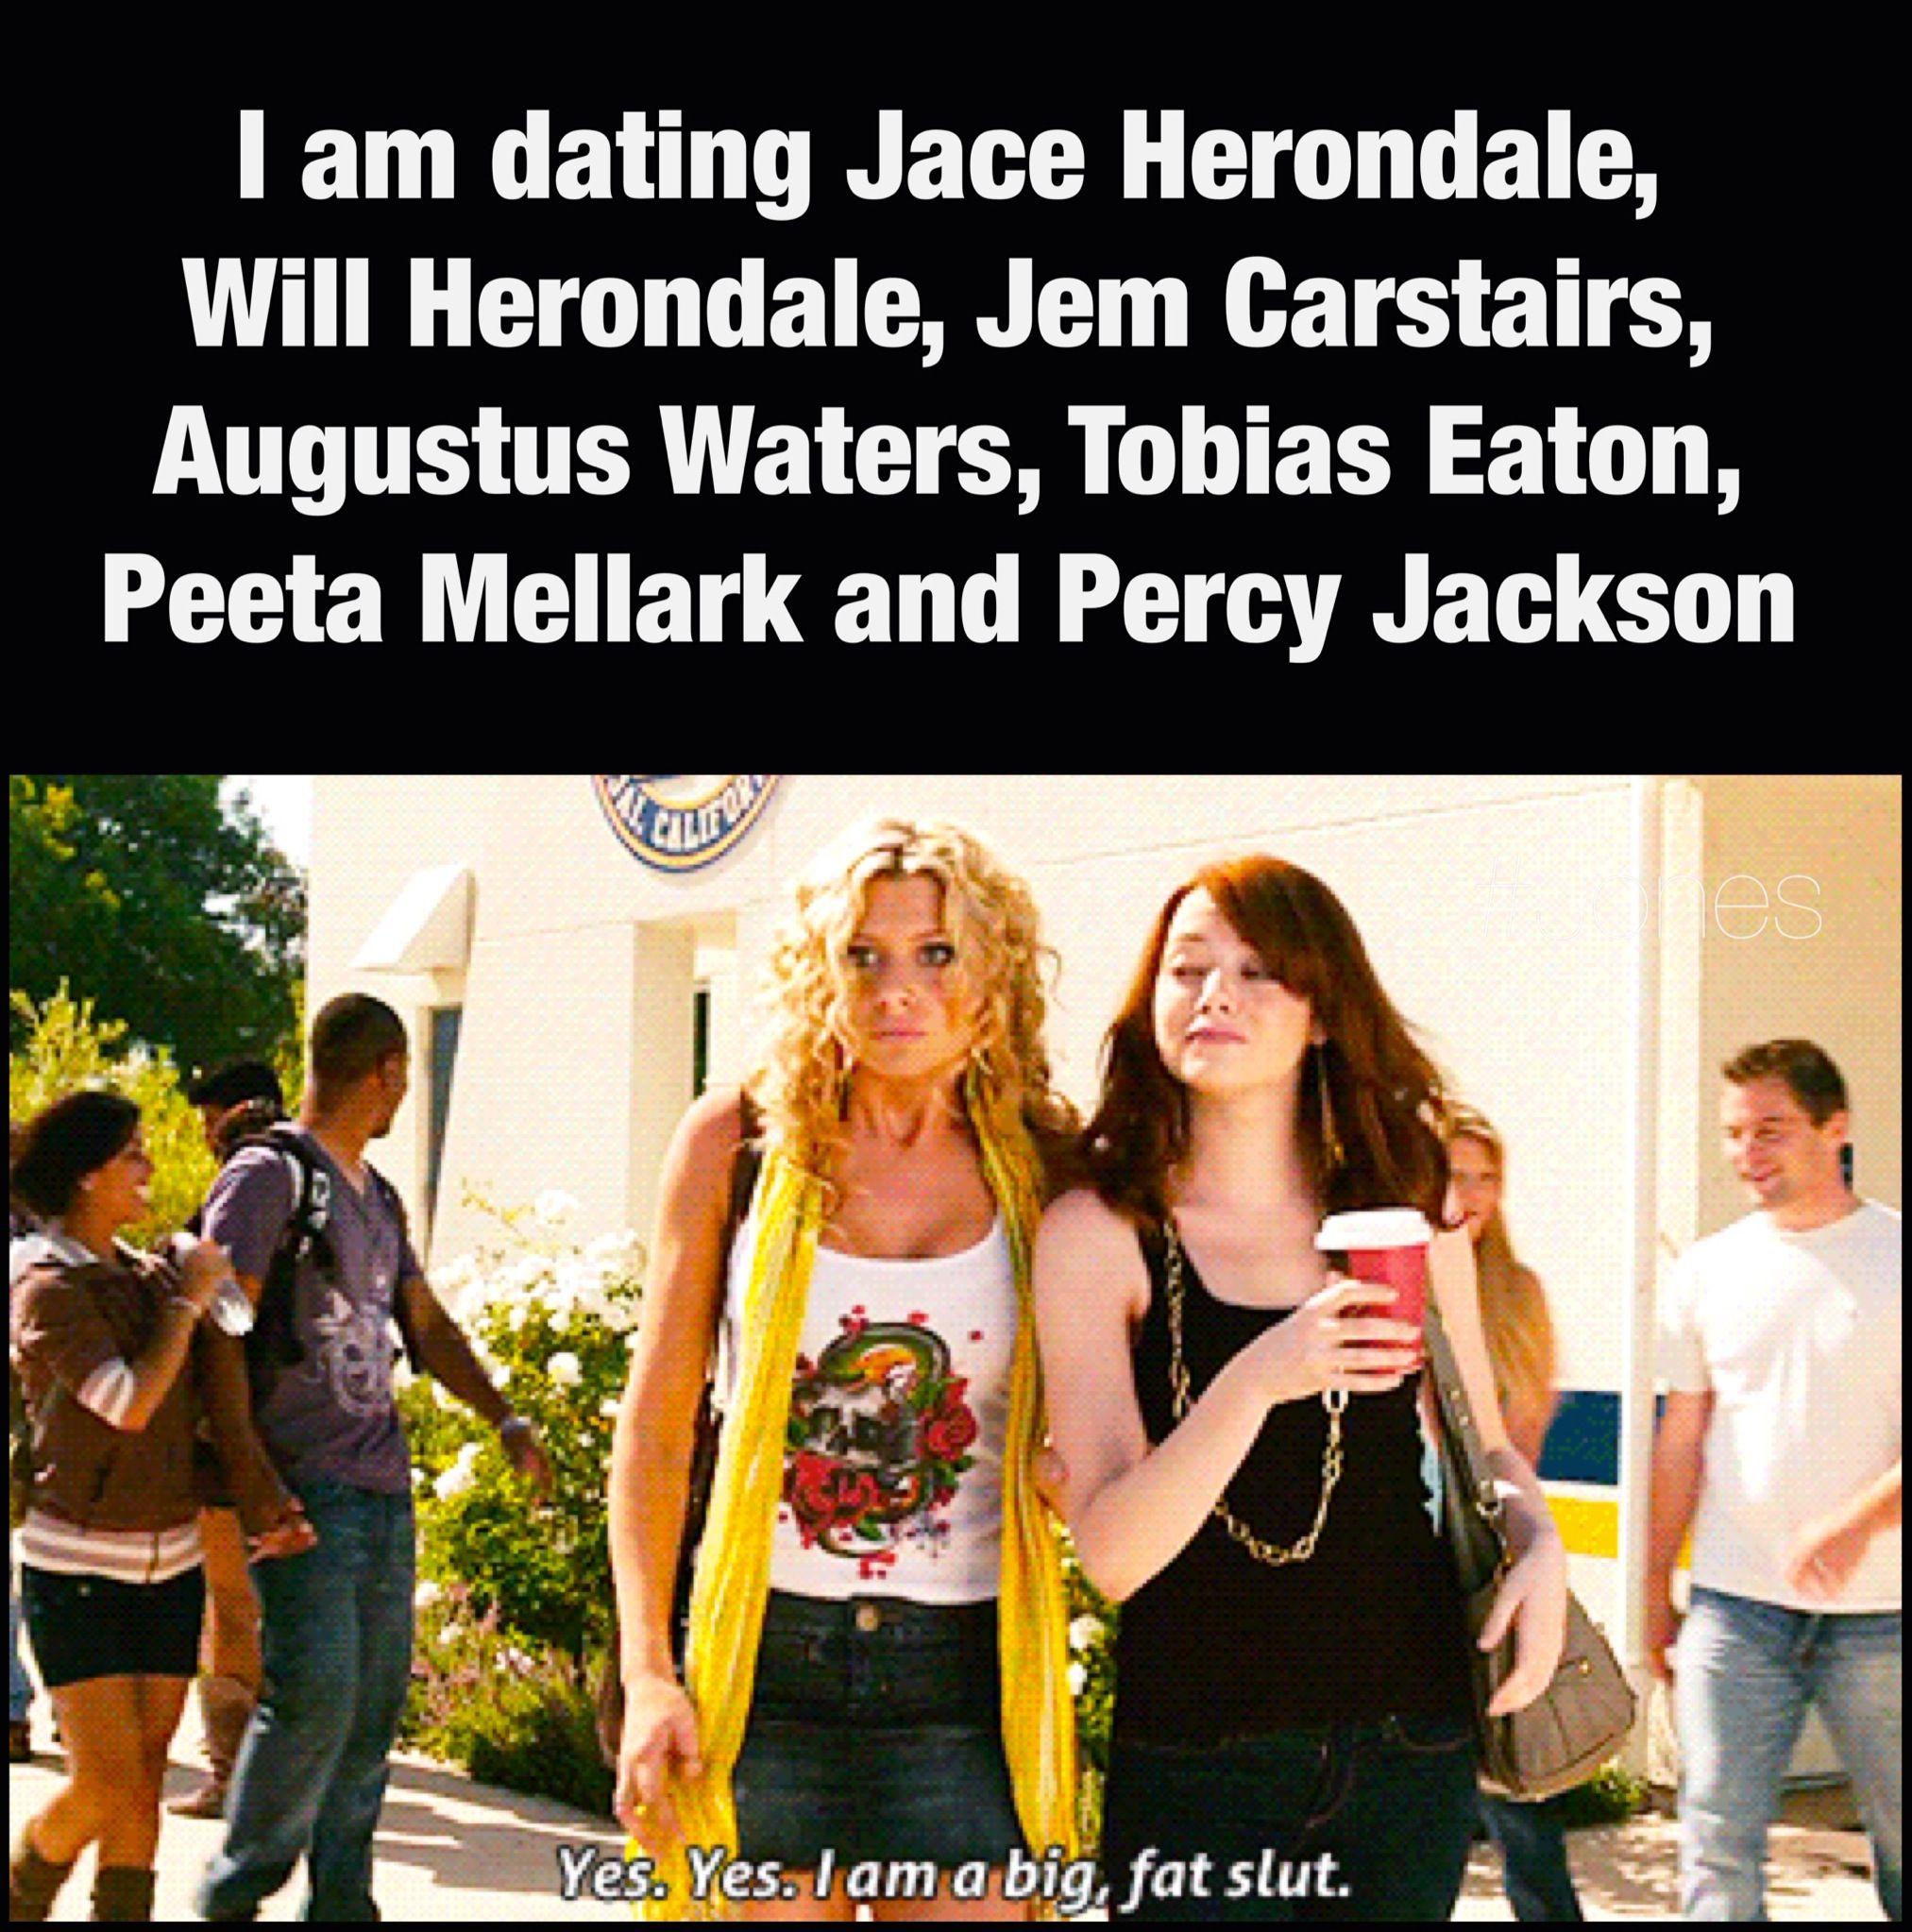 I am dating Jace Herondale, Will Herondale, Jem Carstairs, Augustus Waters, Tobias Eaton, Peeta Mellark and Percy Jackson